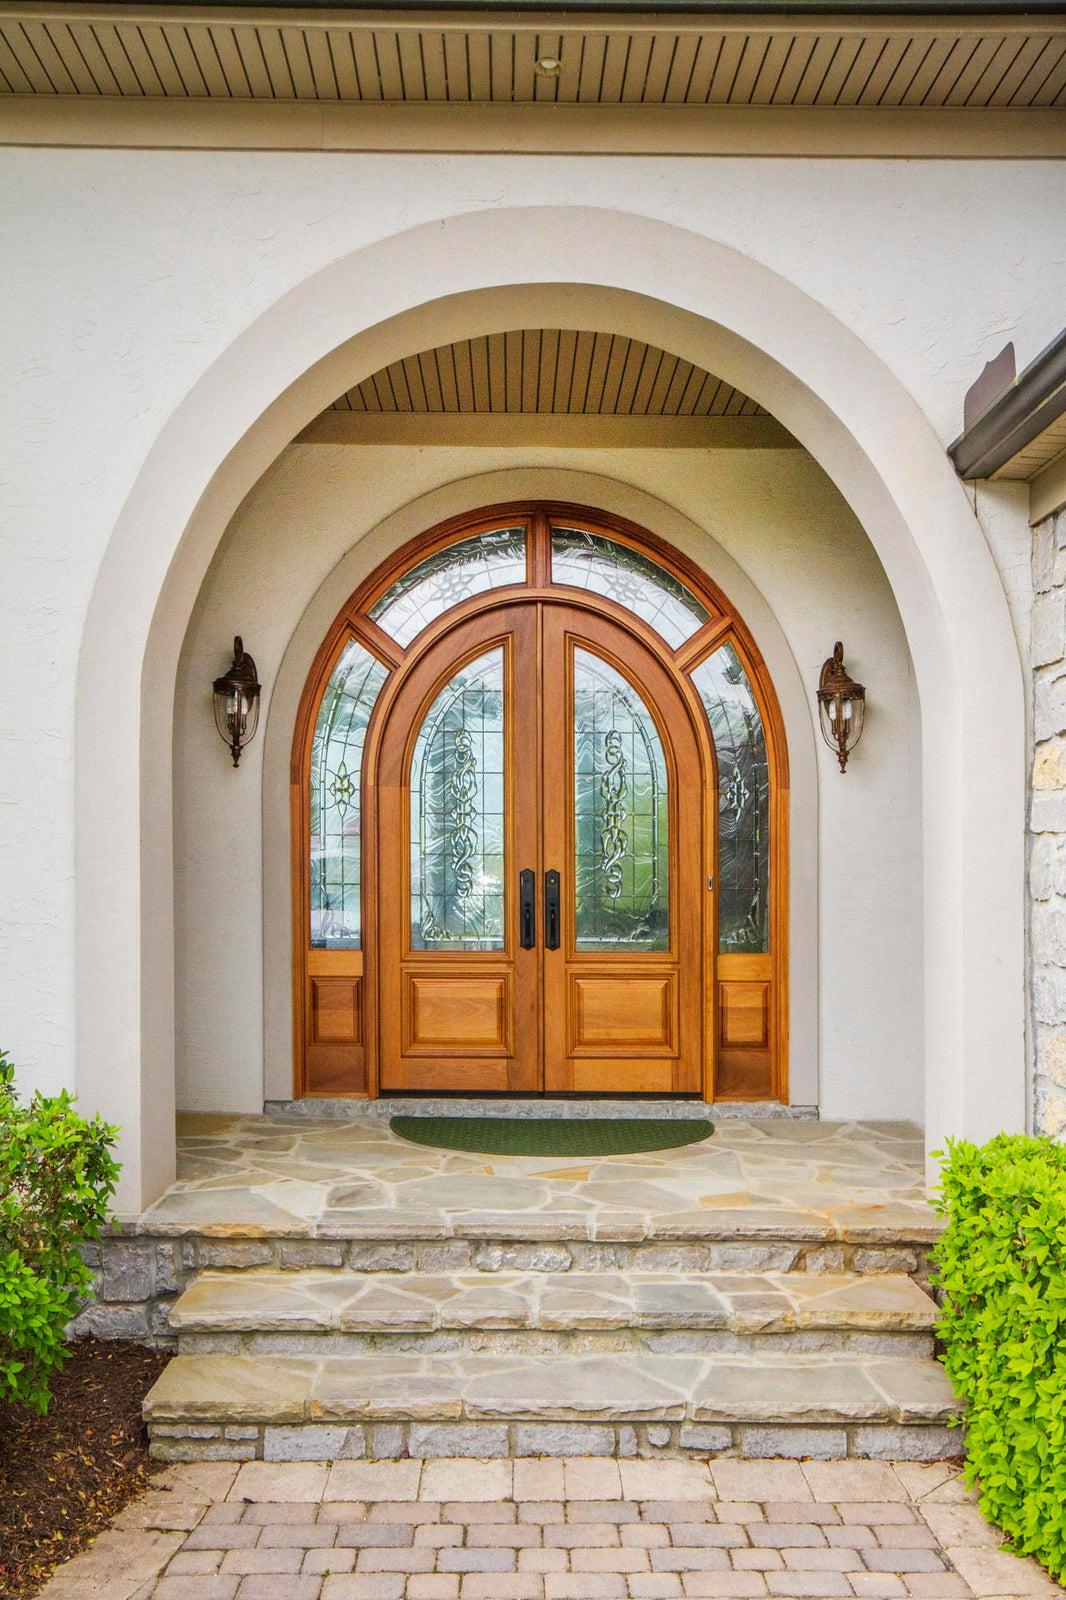 Honduran Mahogany Doors Welcome You...